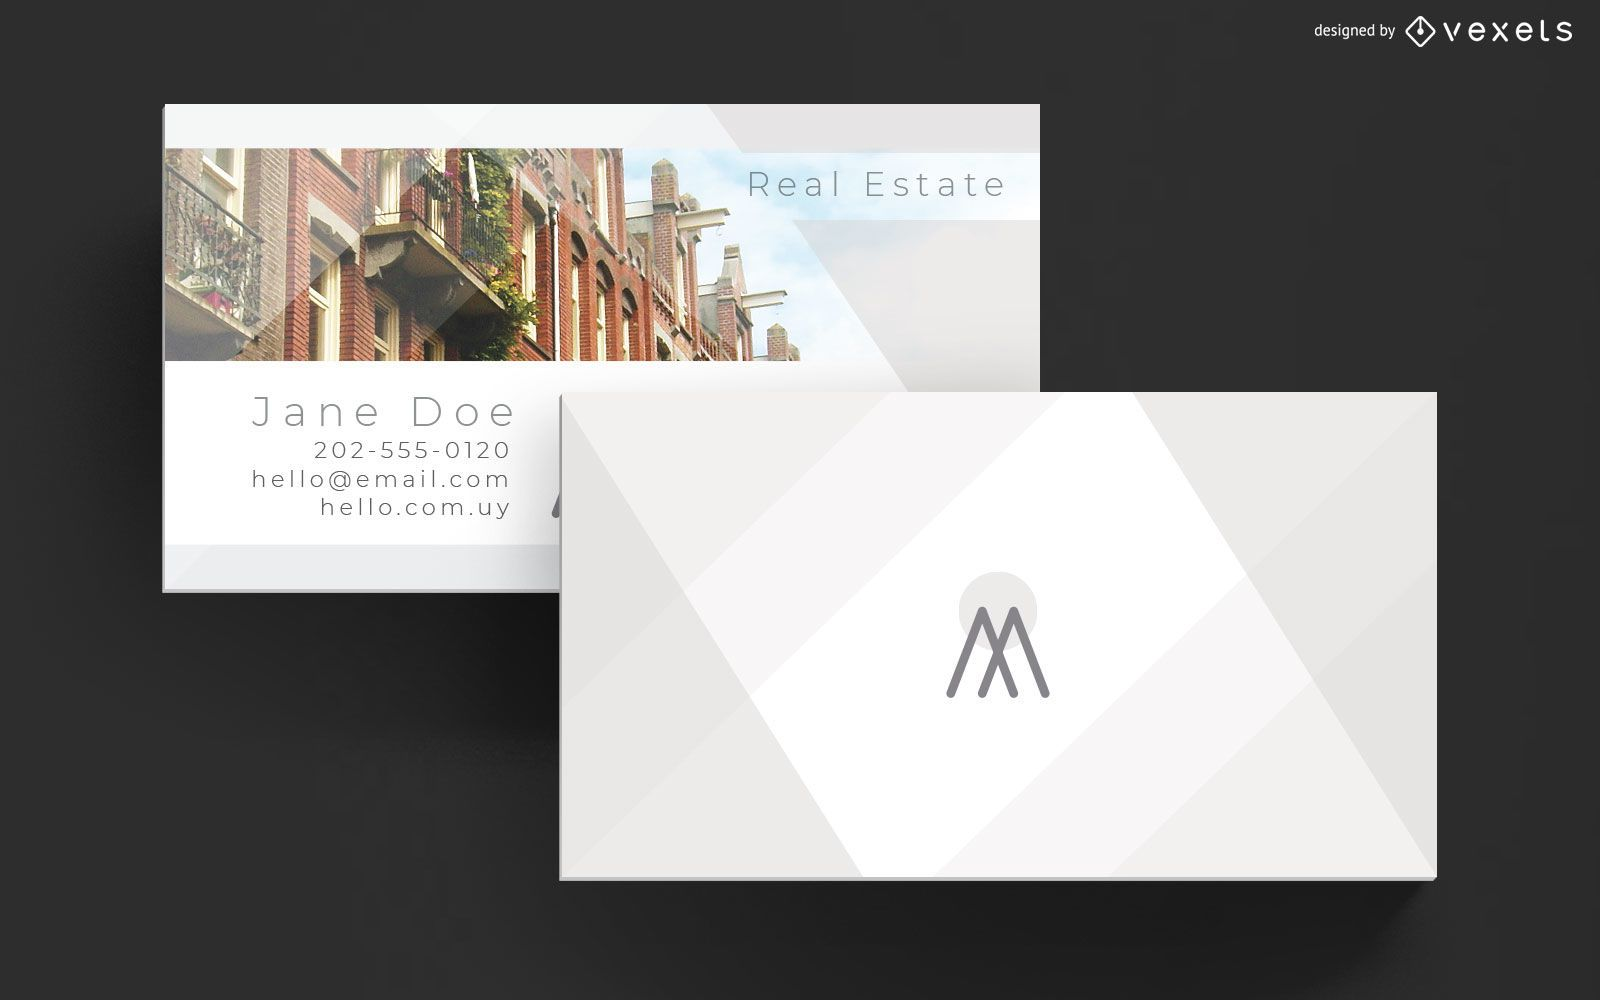 Real Estate Elegant Business Card Template